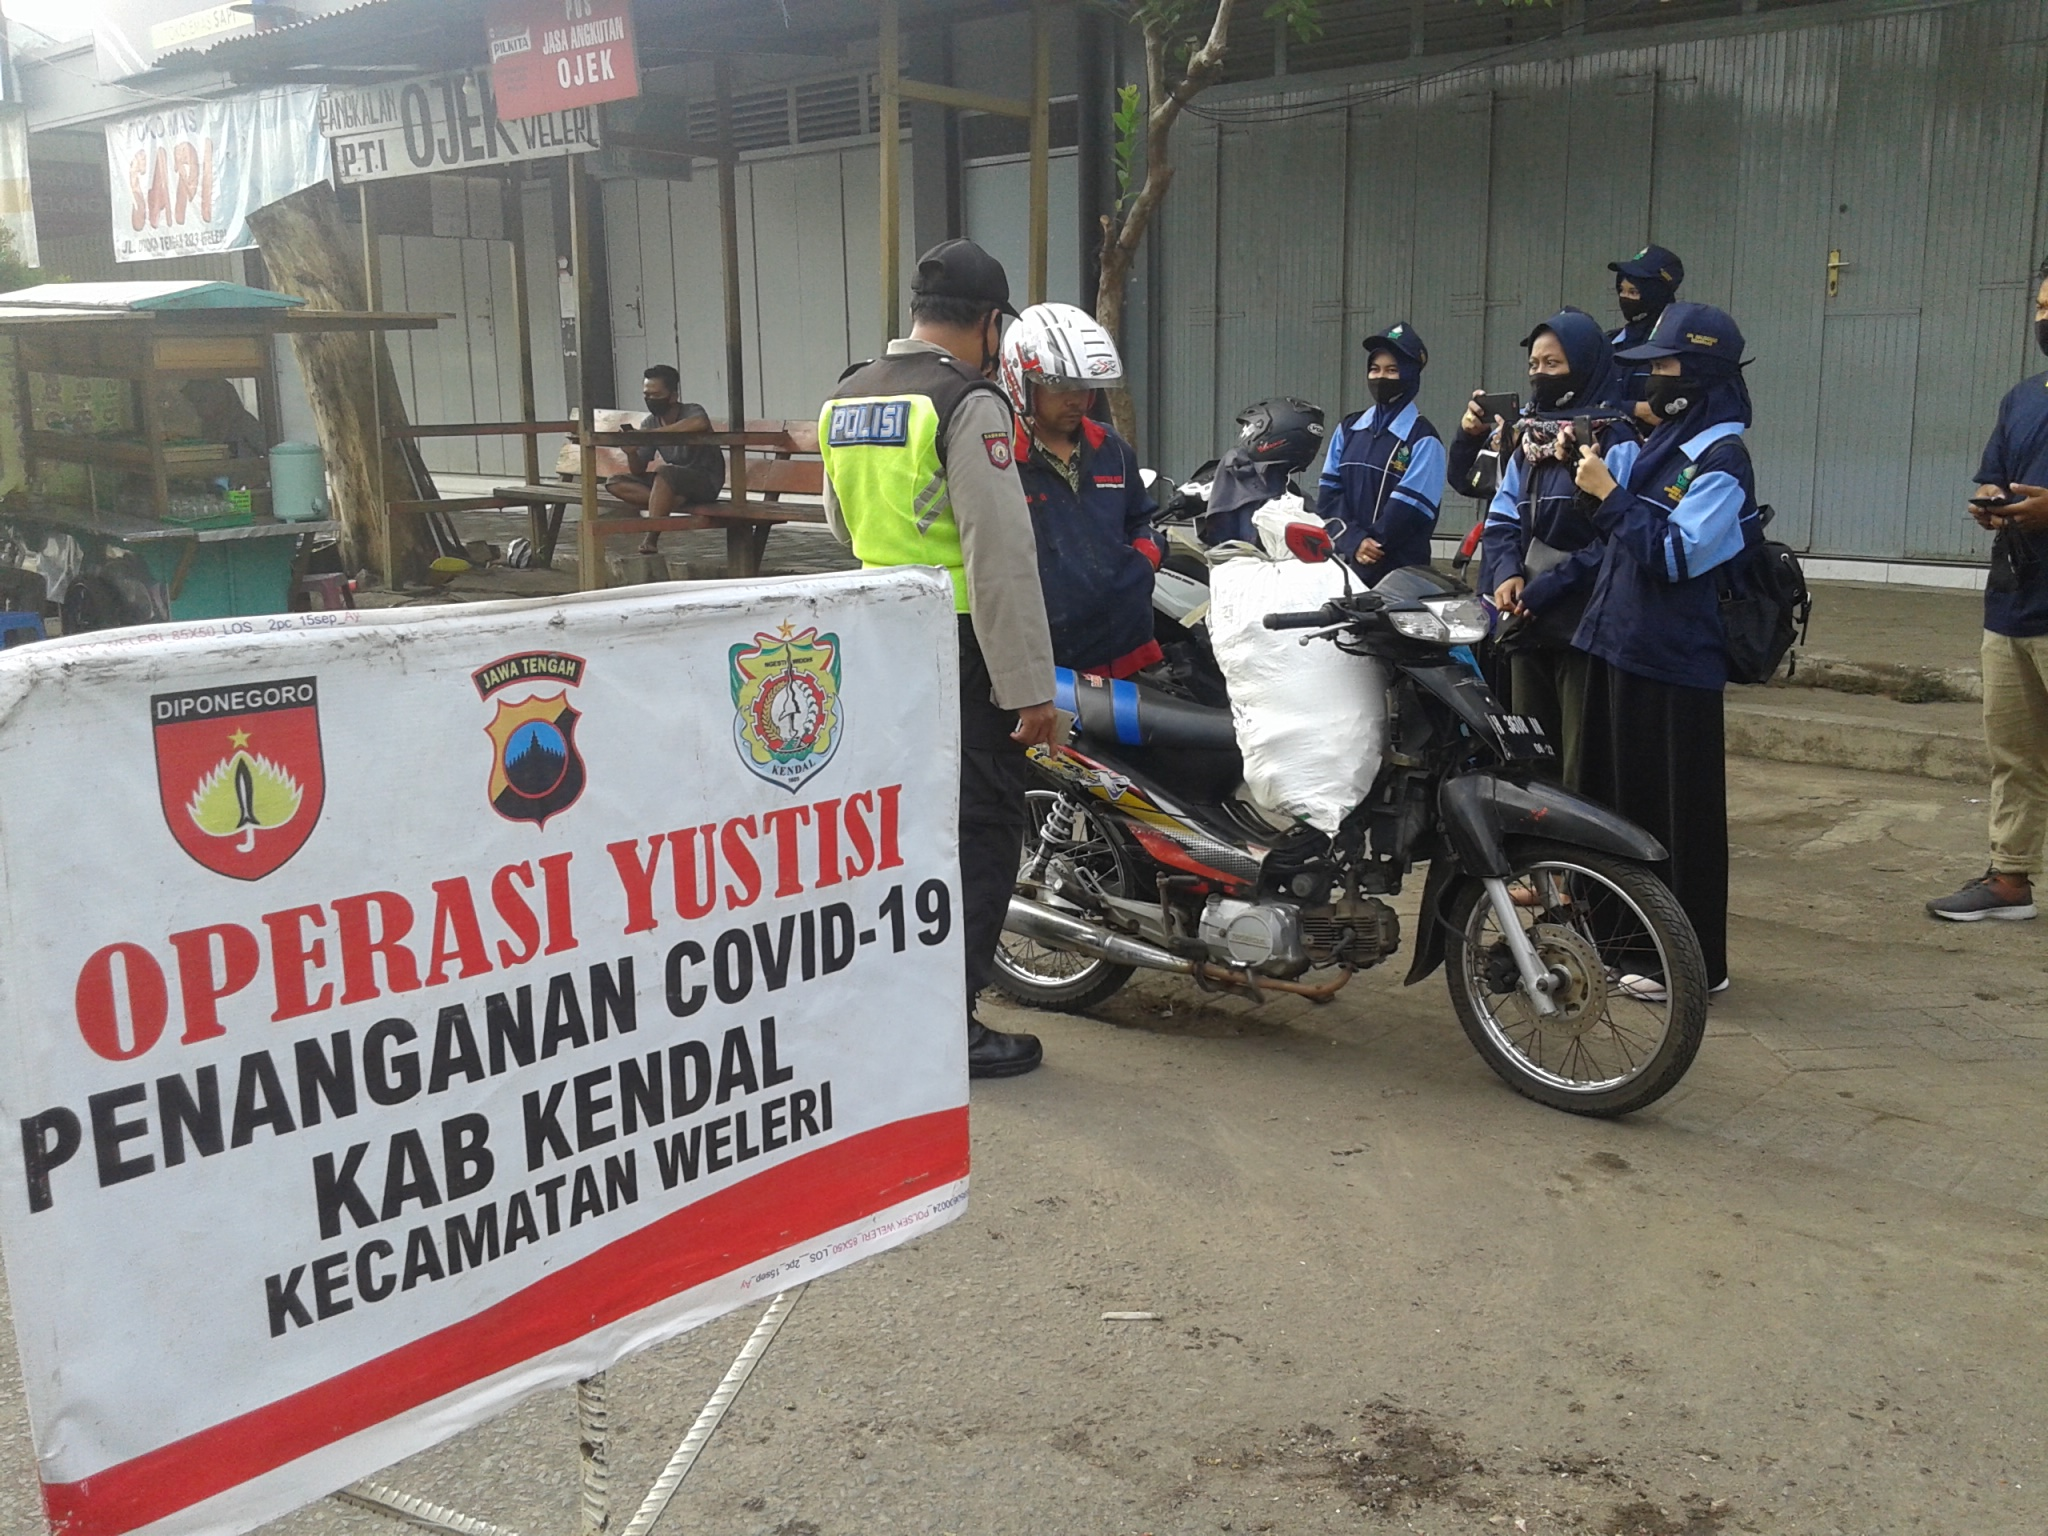 Photo of Gandeng Kepolisian, Belasan Mahasiswa UIN Walisongo 'Razia' Masker di Weleri